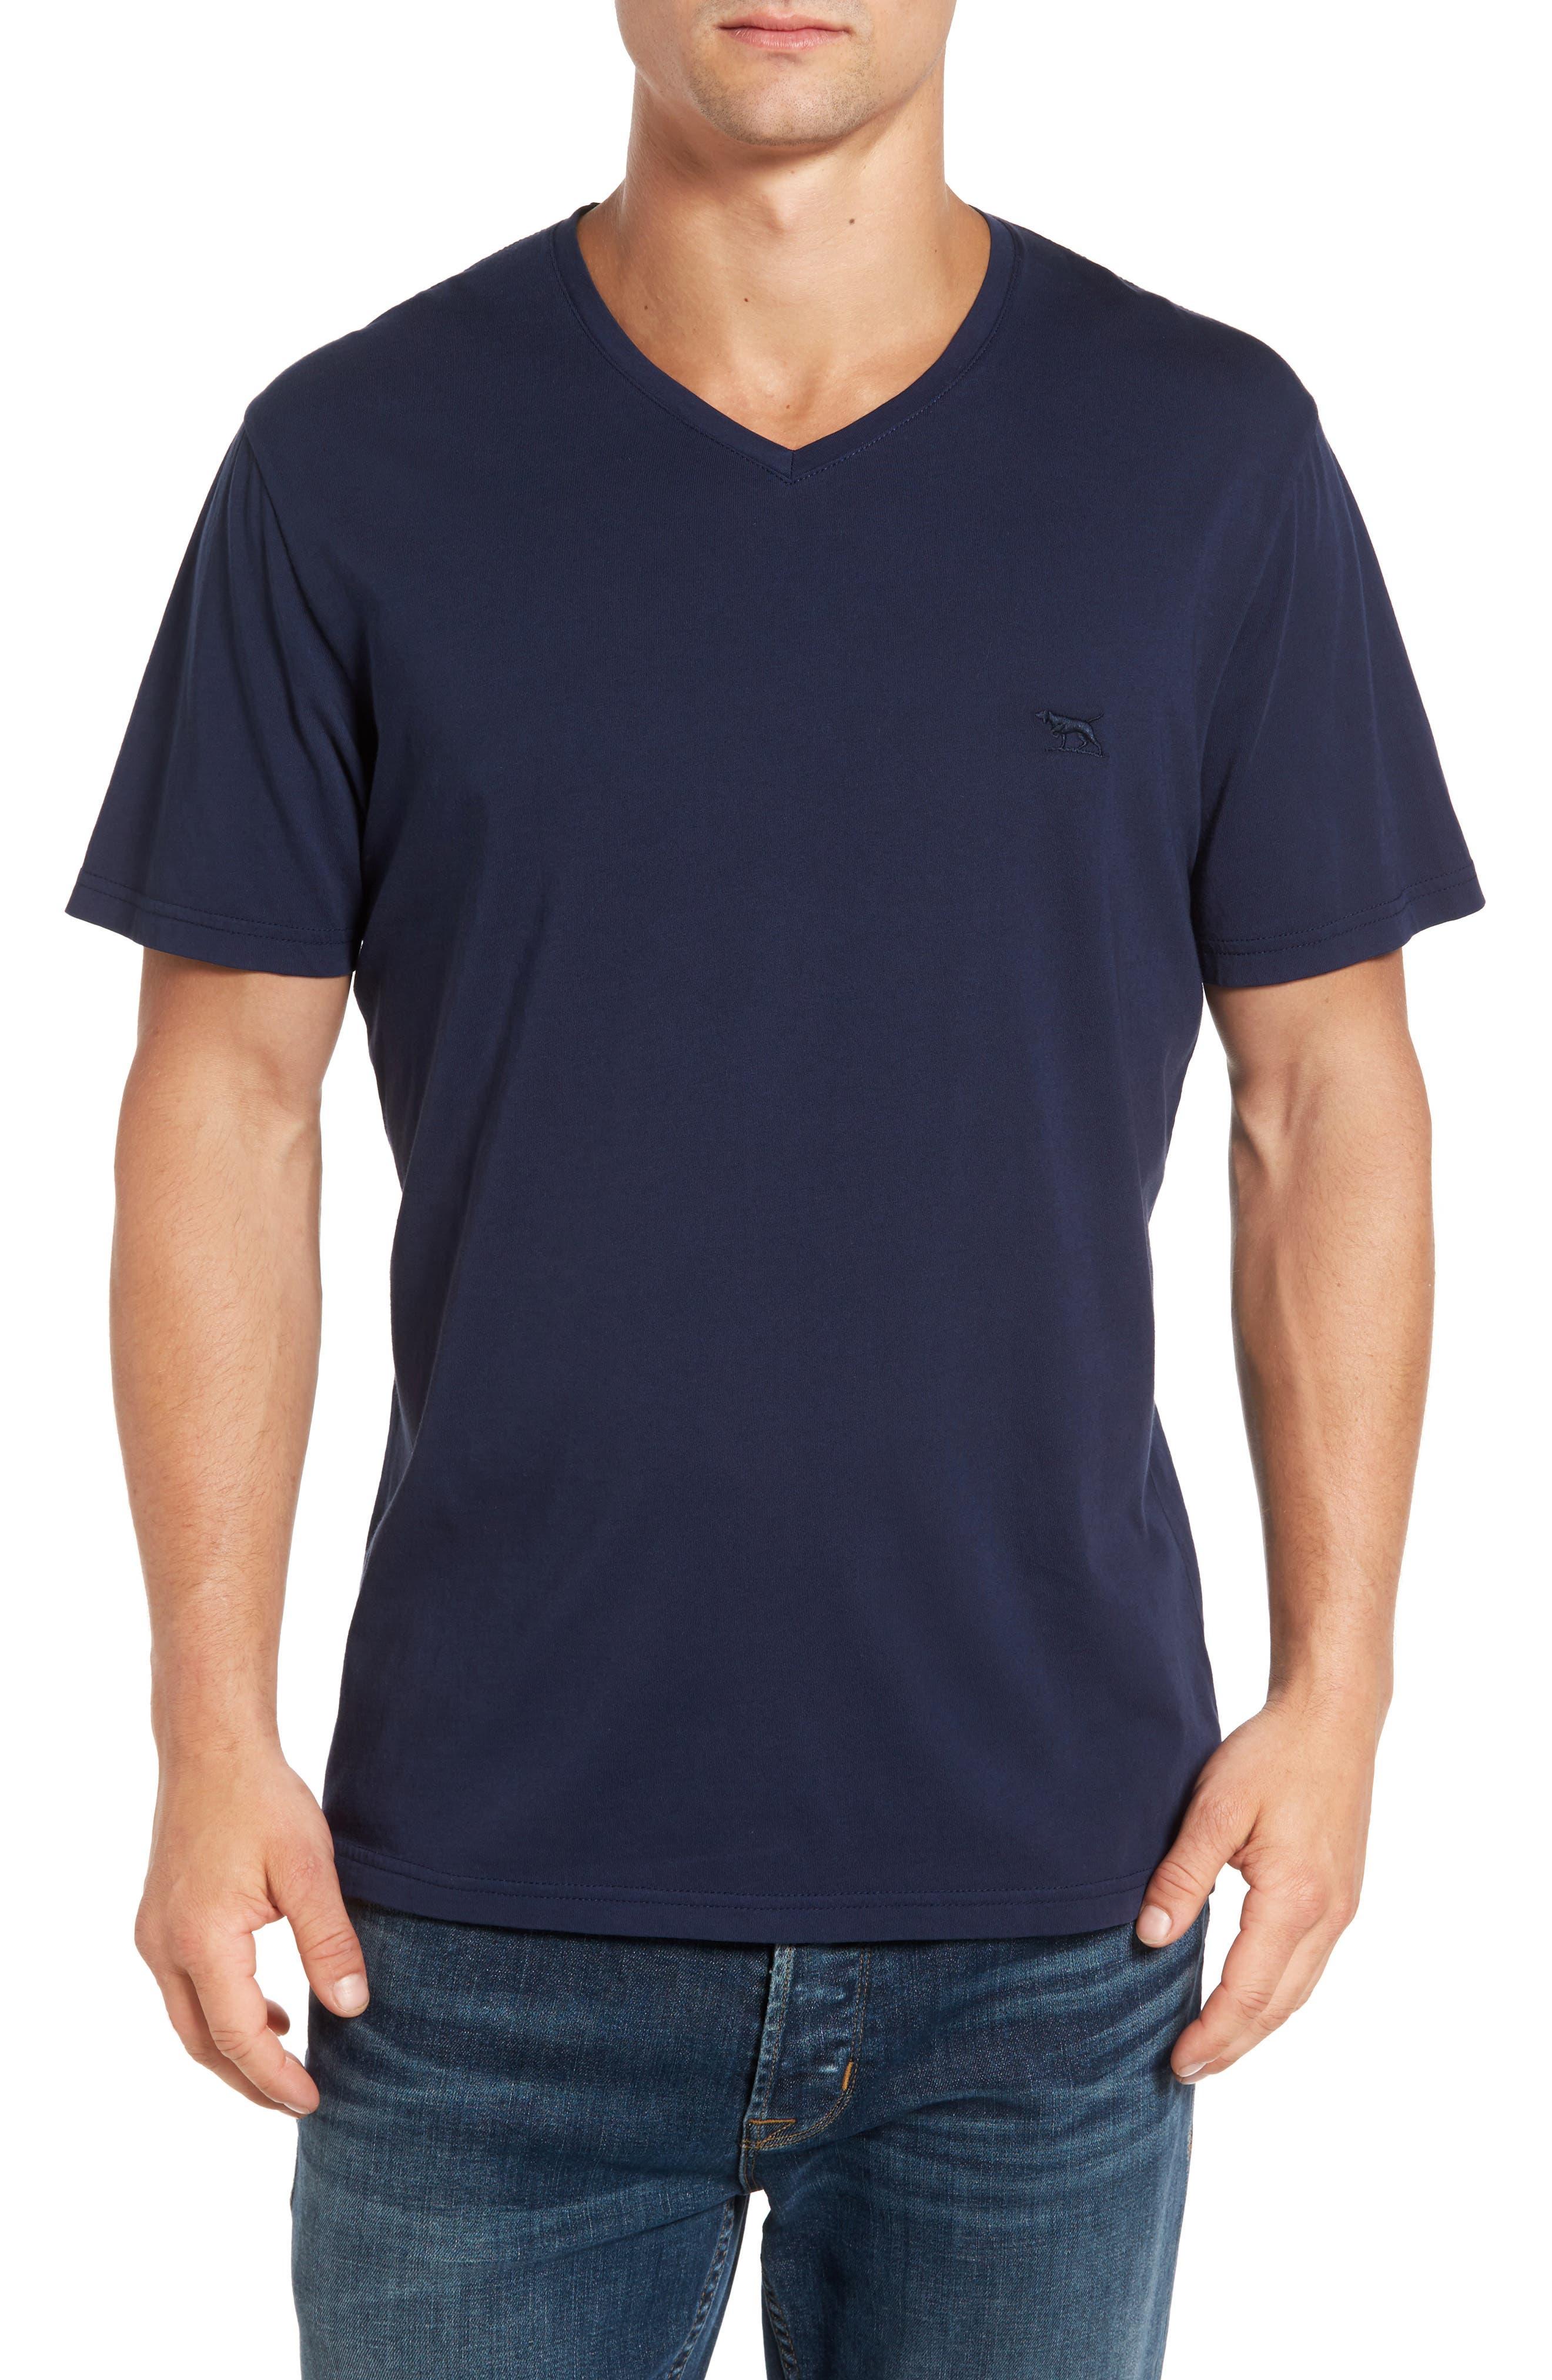 RODD & GUNN Solway Sports Fit V-Neck T-Shirt